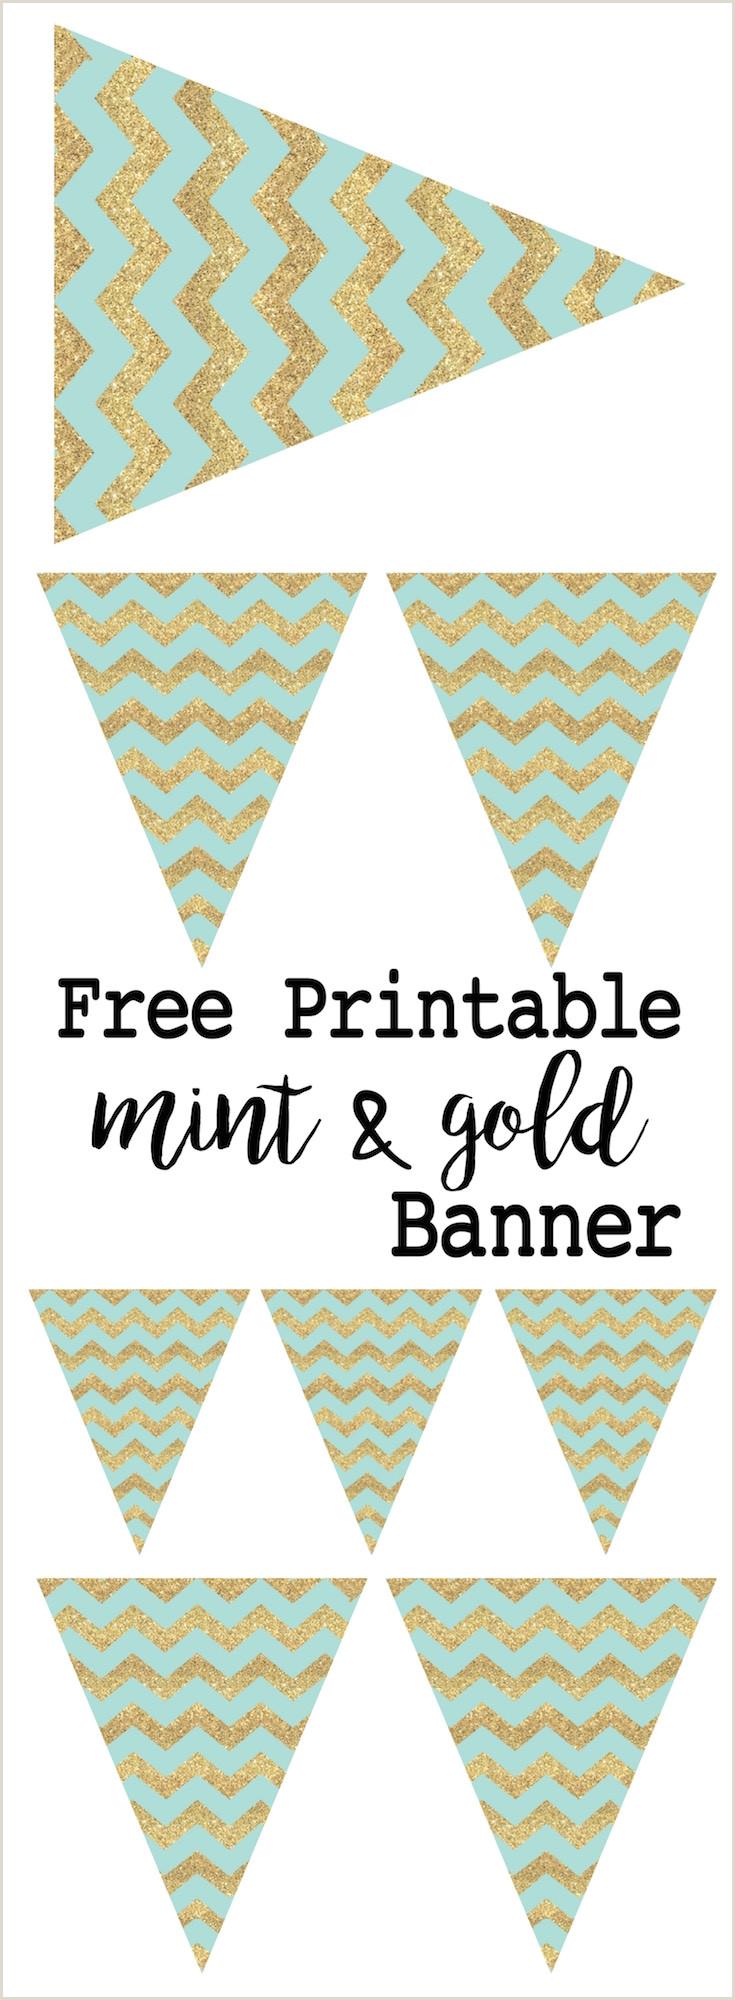 Vistaprint Custom Banners Printed Mint Template